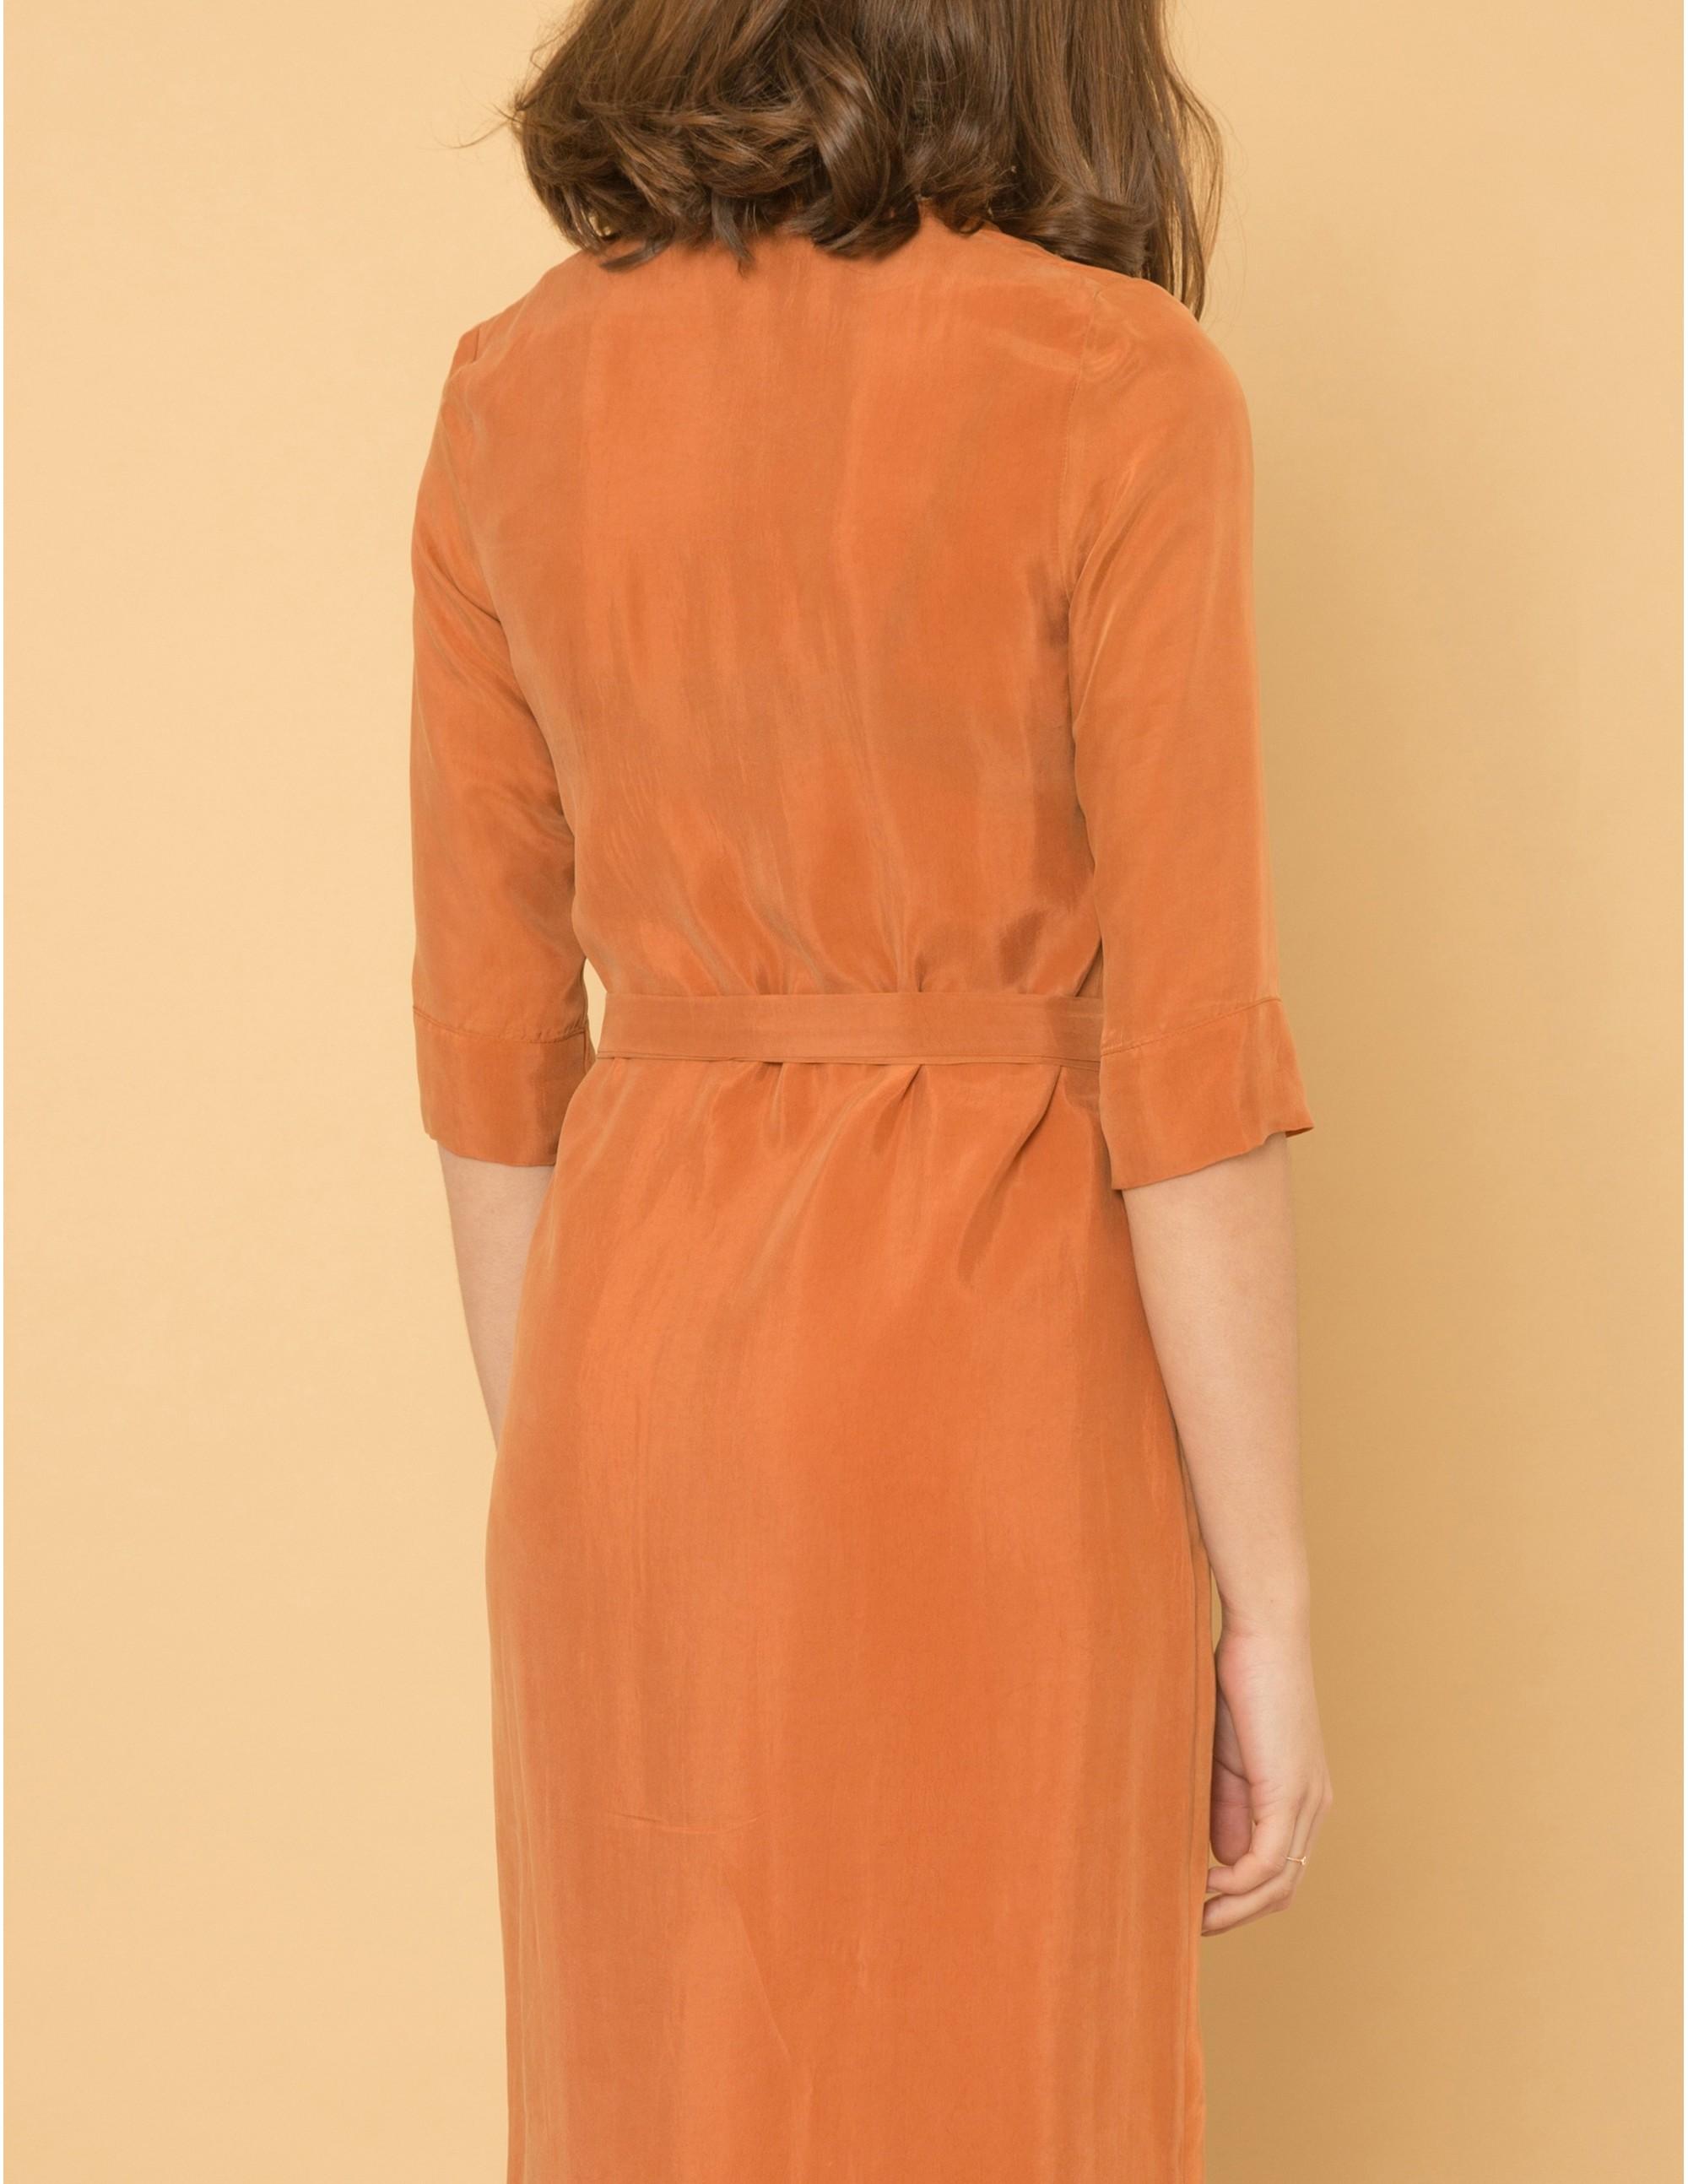 SEDUCTION Dress - SWEET CINNAMON